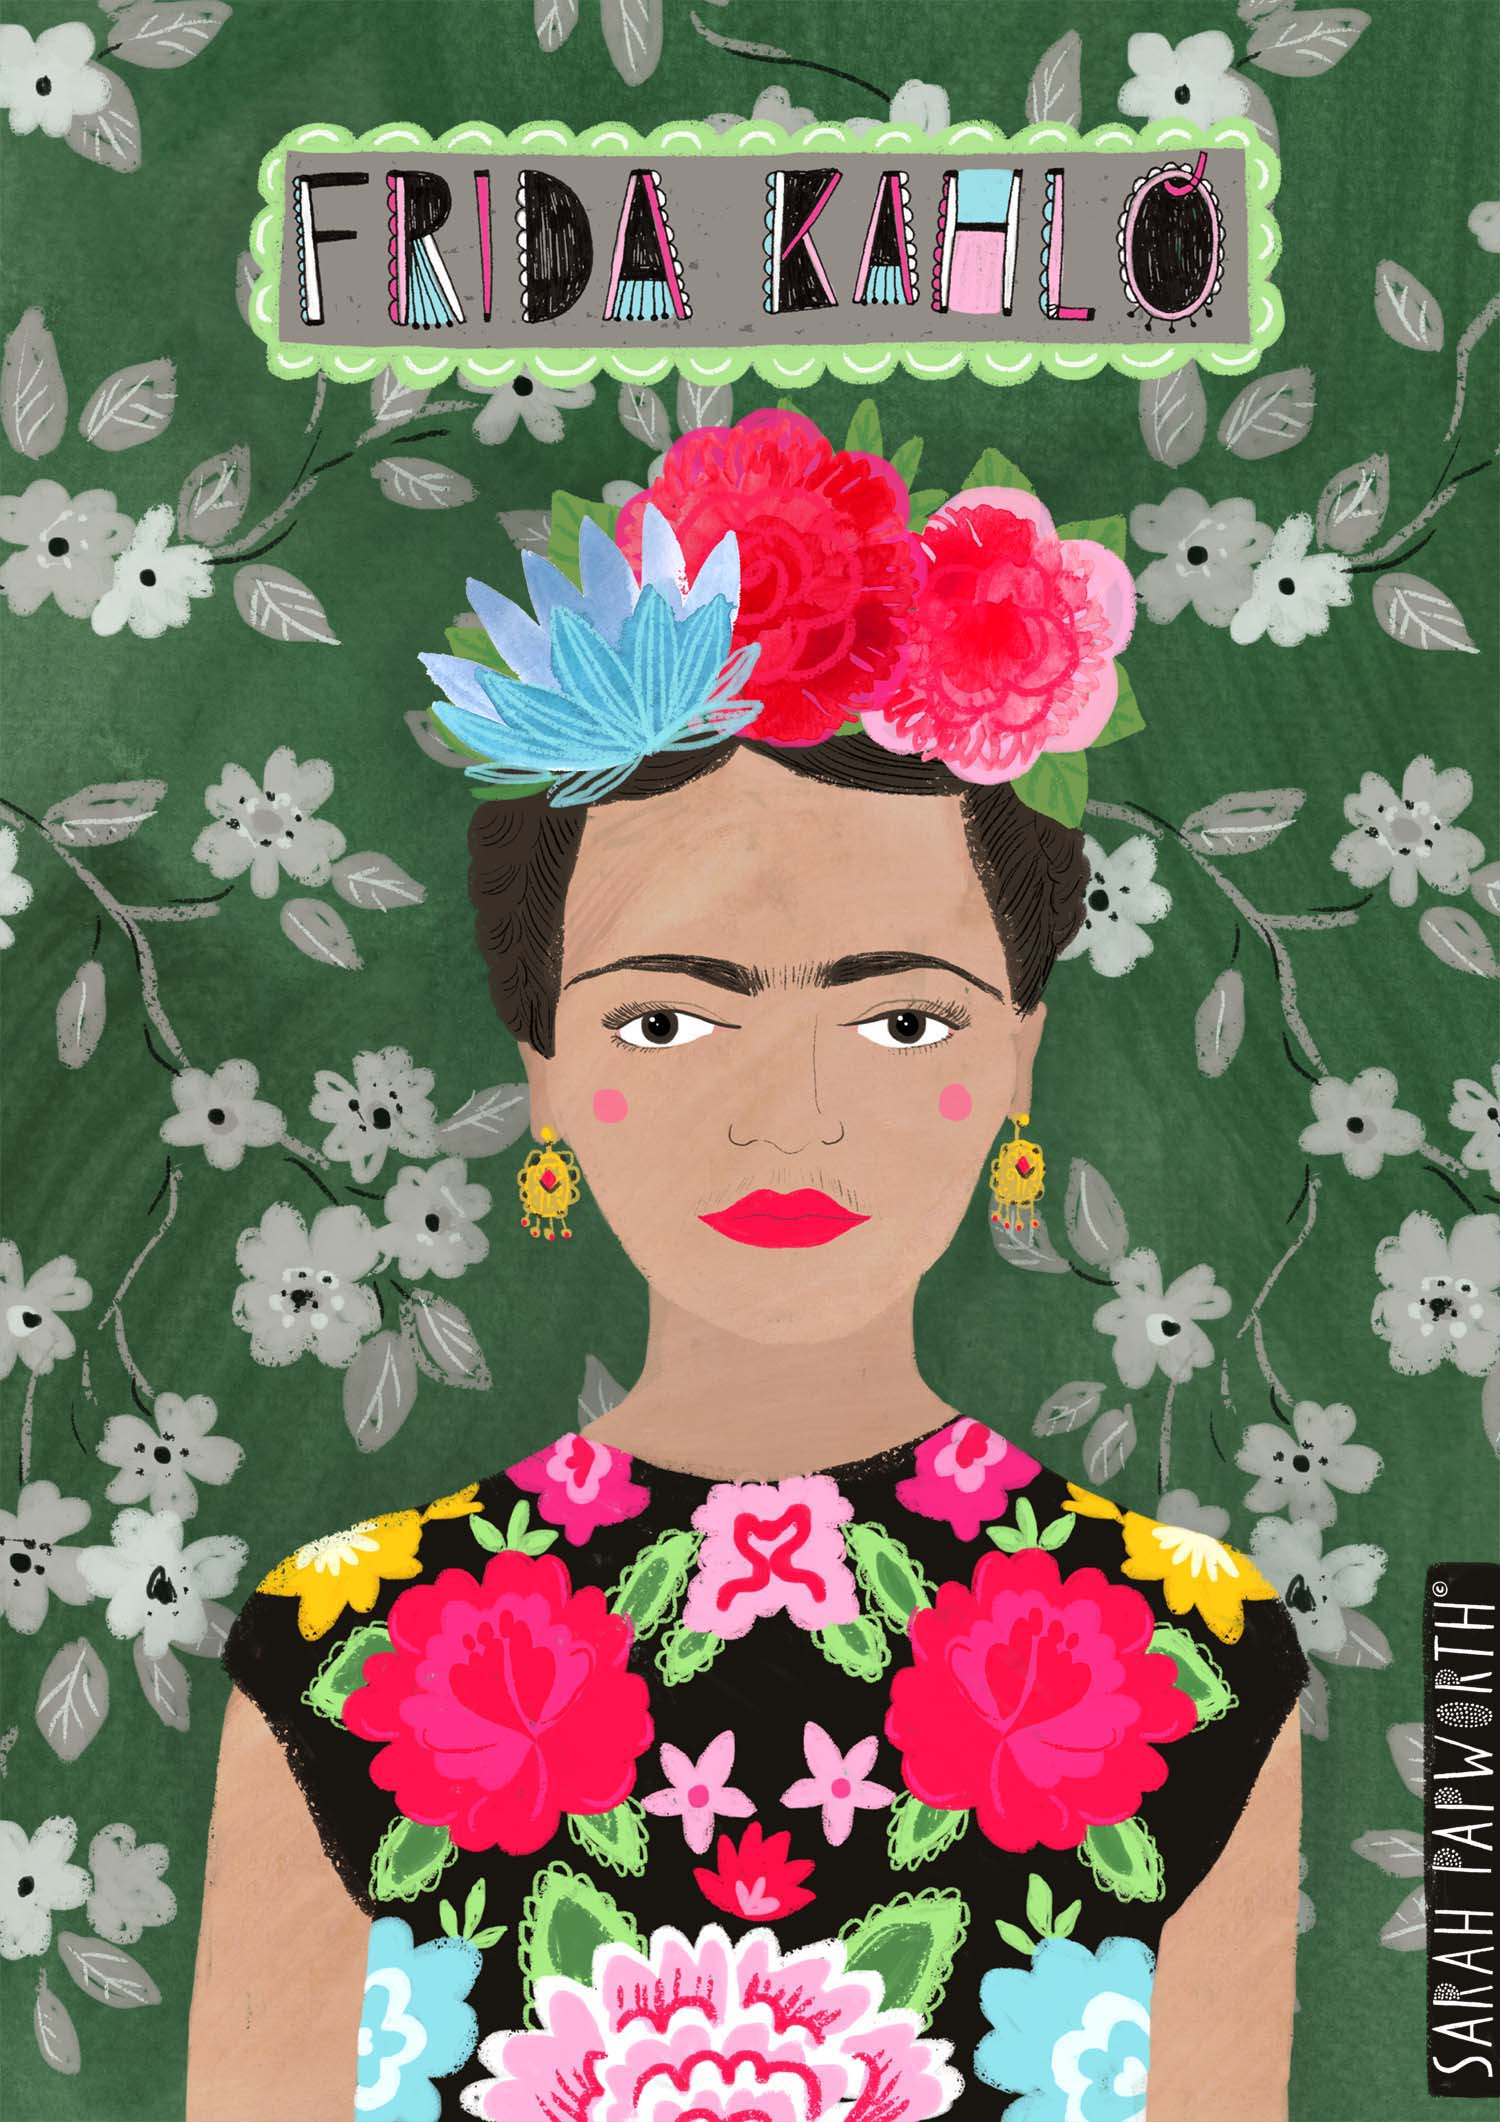 frida khalo print artwork published book art sarah papworth.jpg